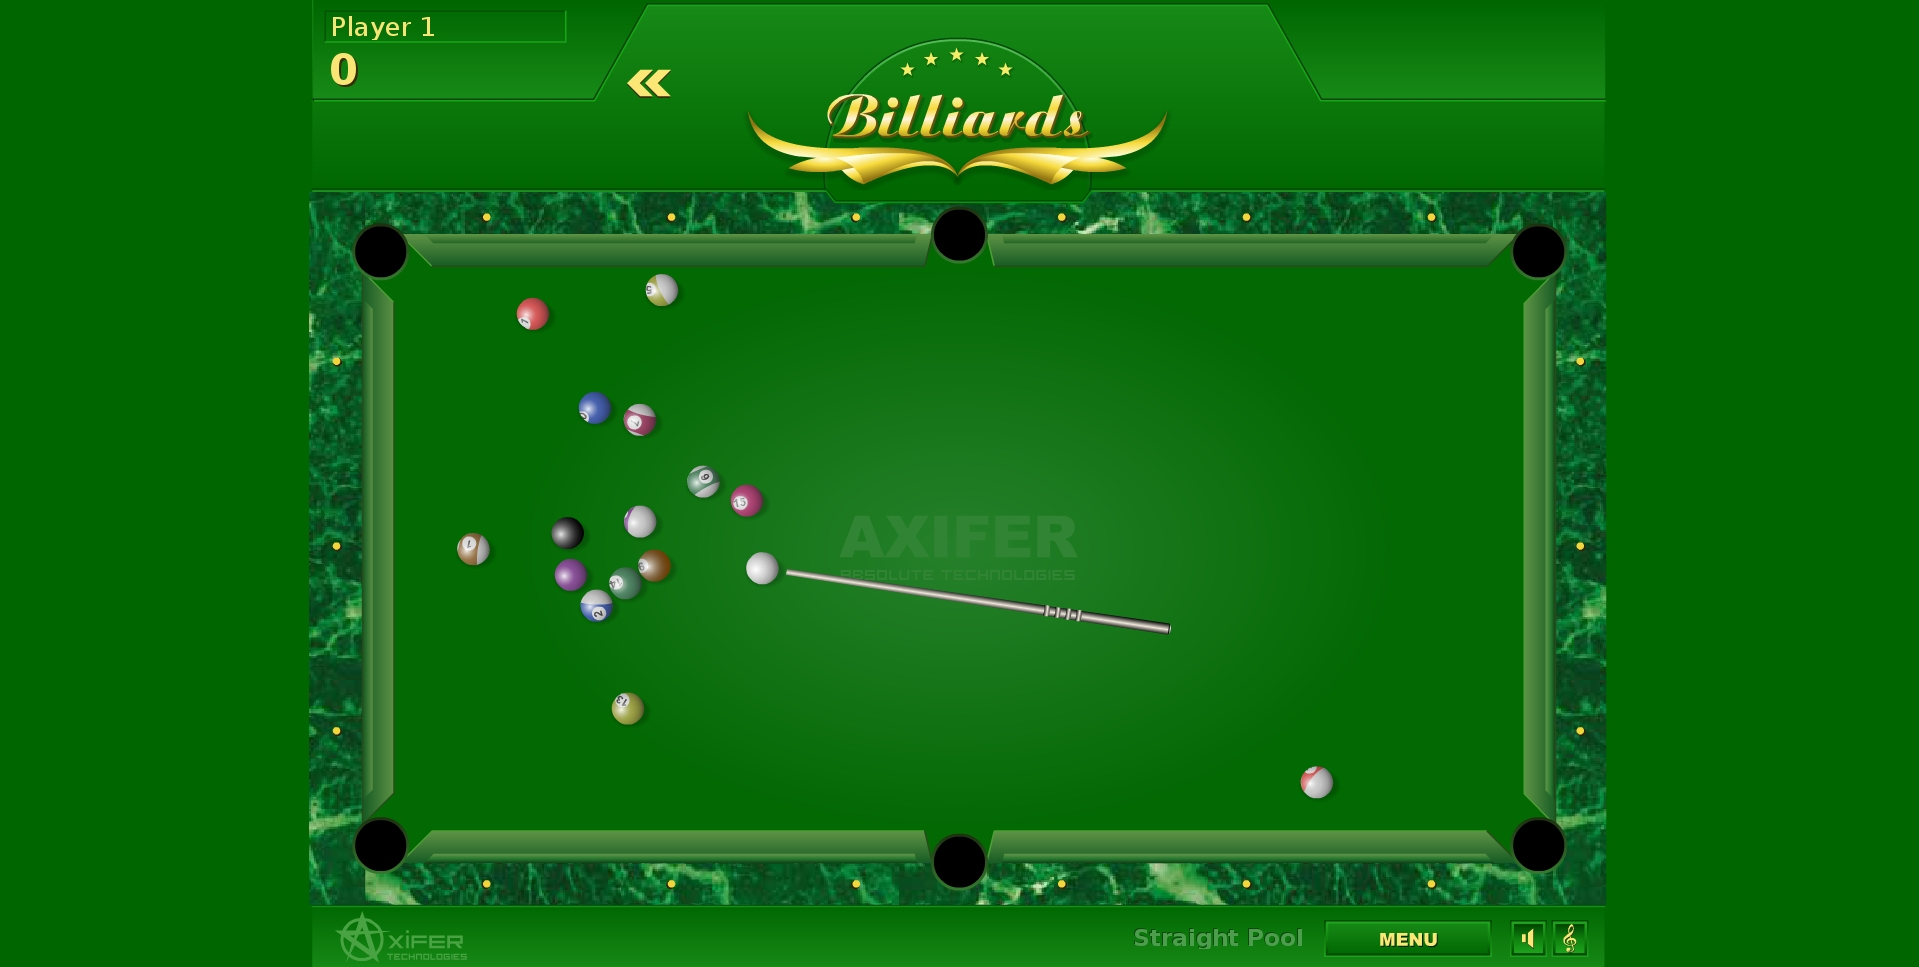 Jeu Billard Billiards Gratuit En Ligne à Jeux Gratuit Billard